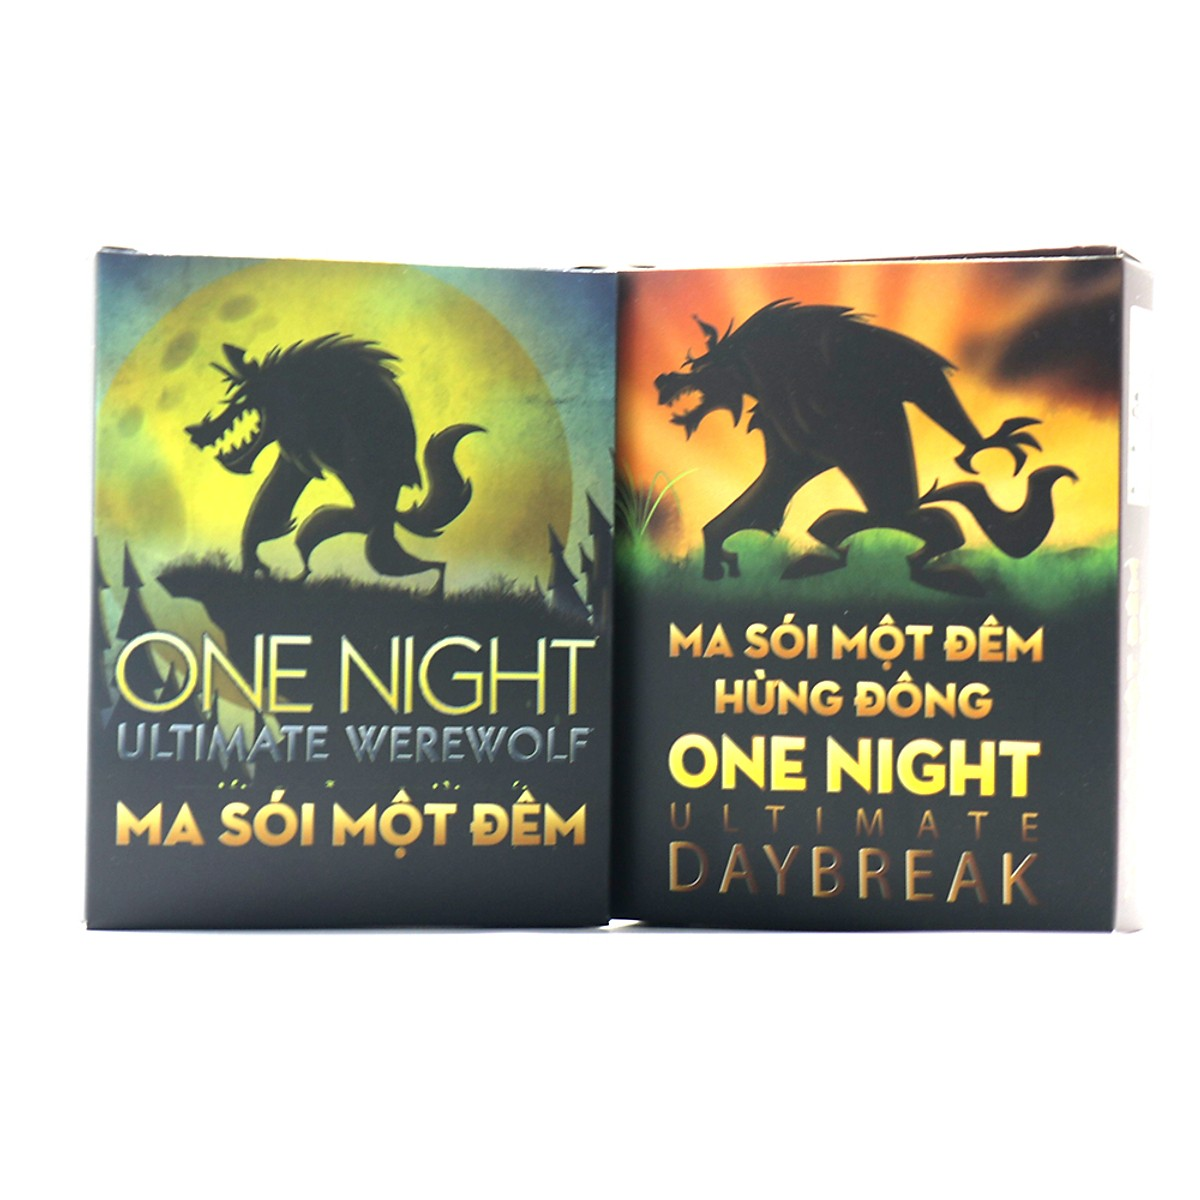 Combo ma sói một đêm One Night + DayBreak Việt Hóa